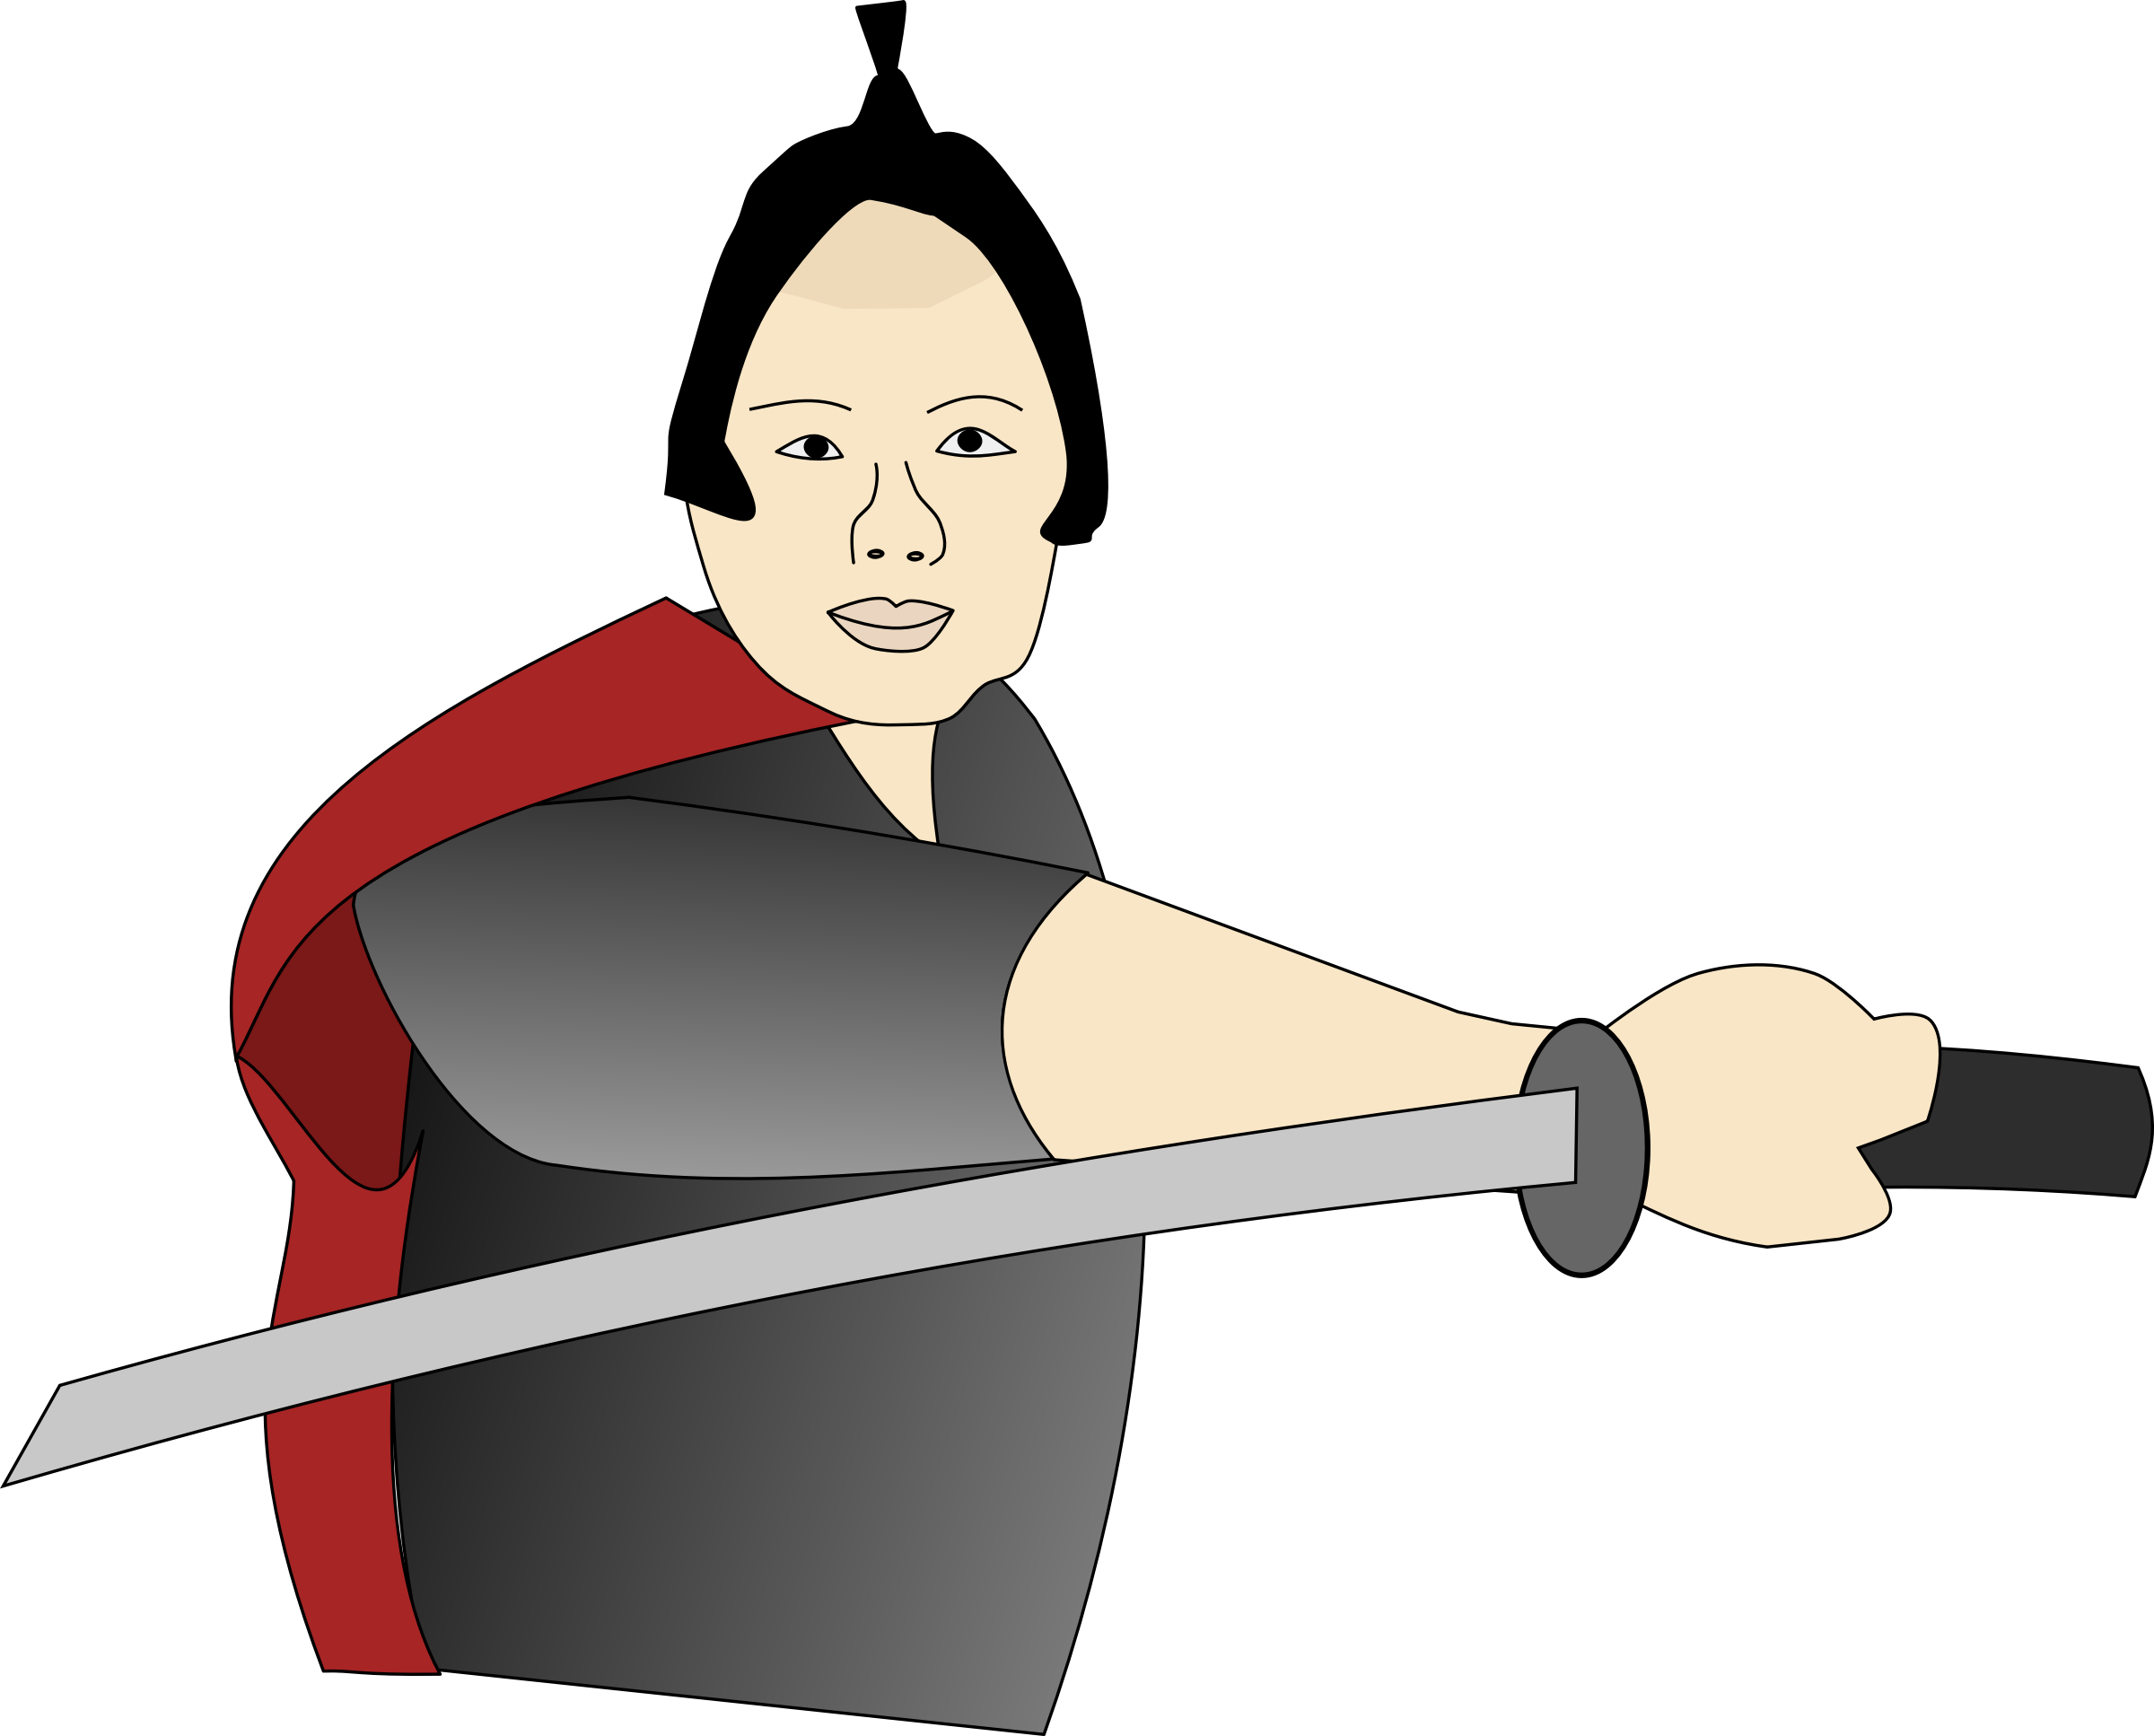 clip art library Guy big image png. Samurai clipart.